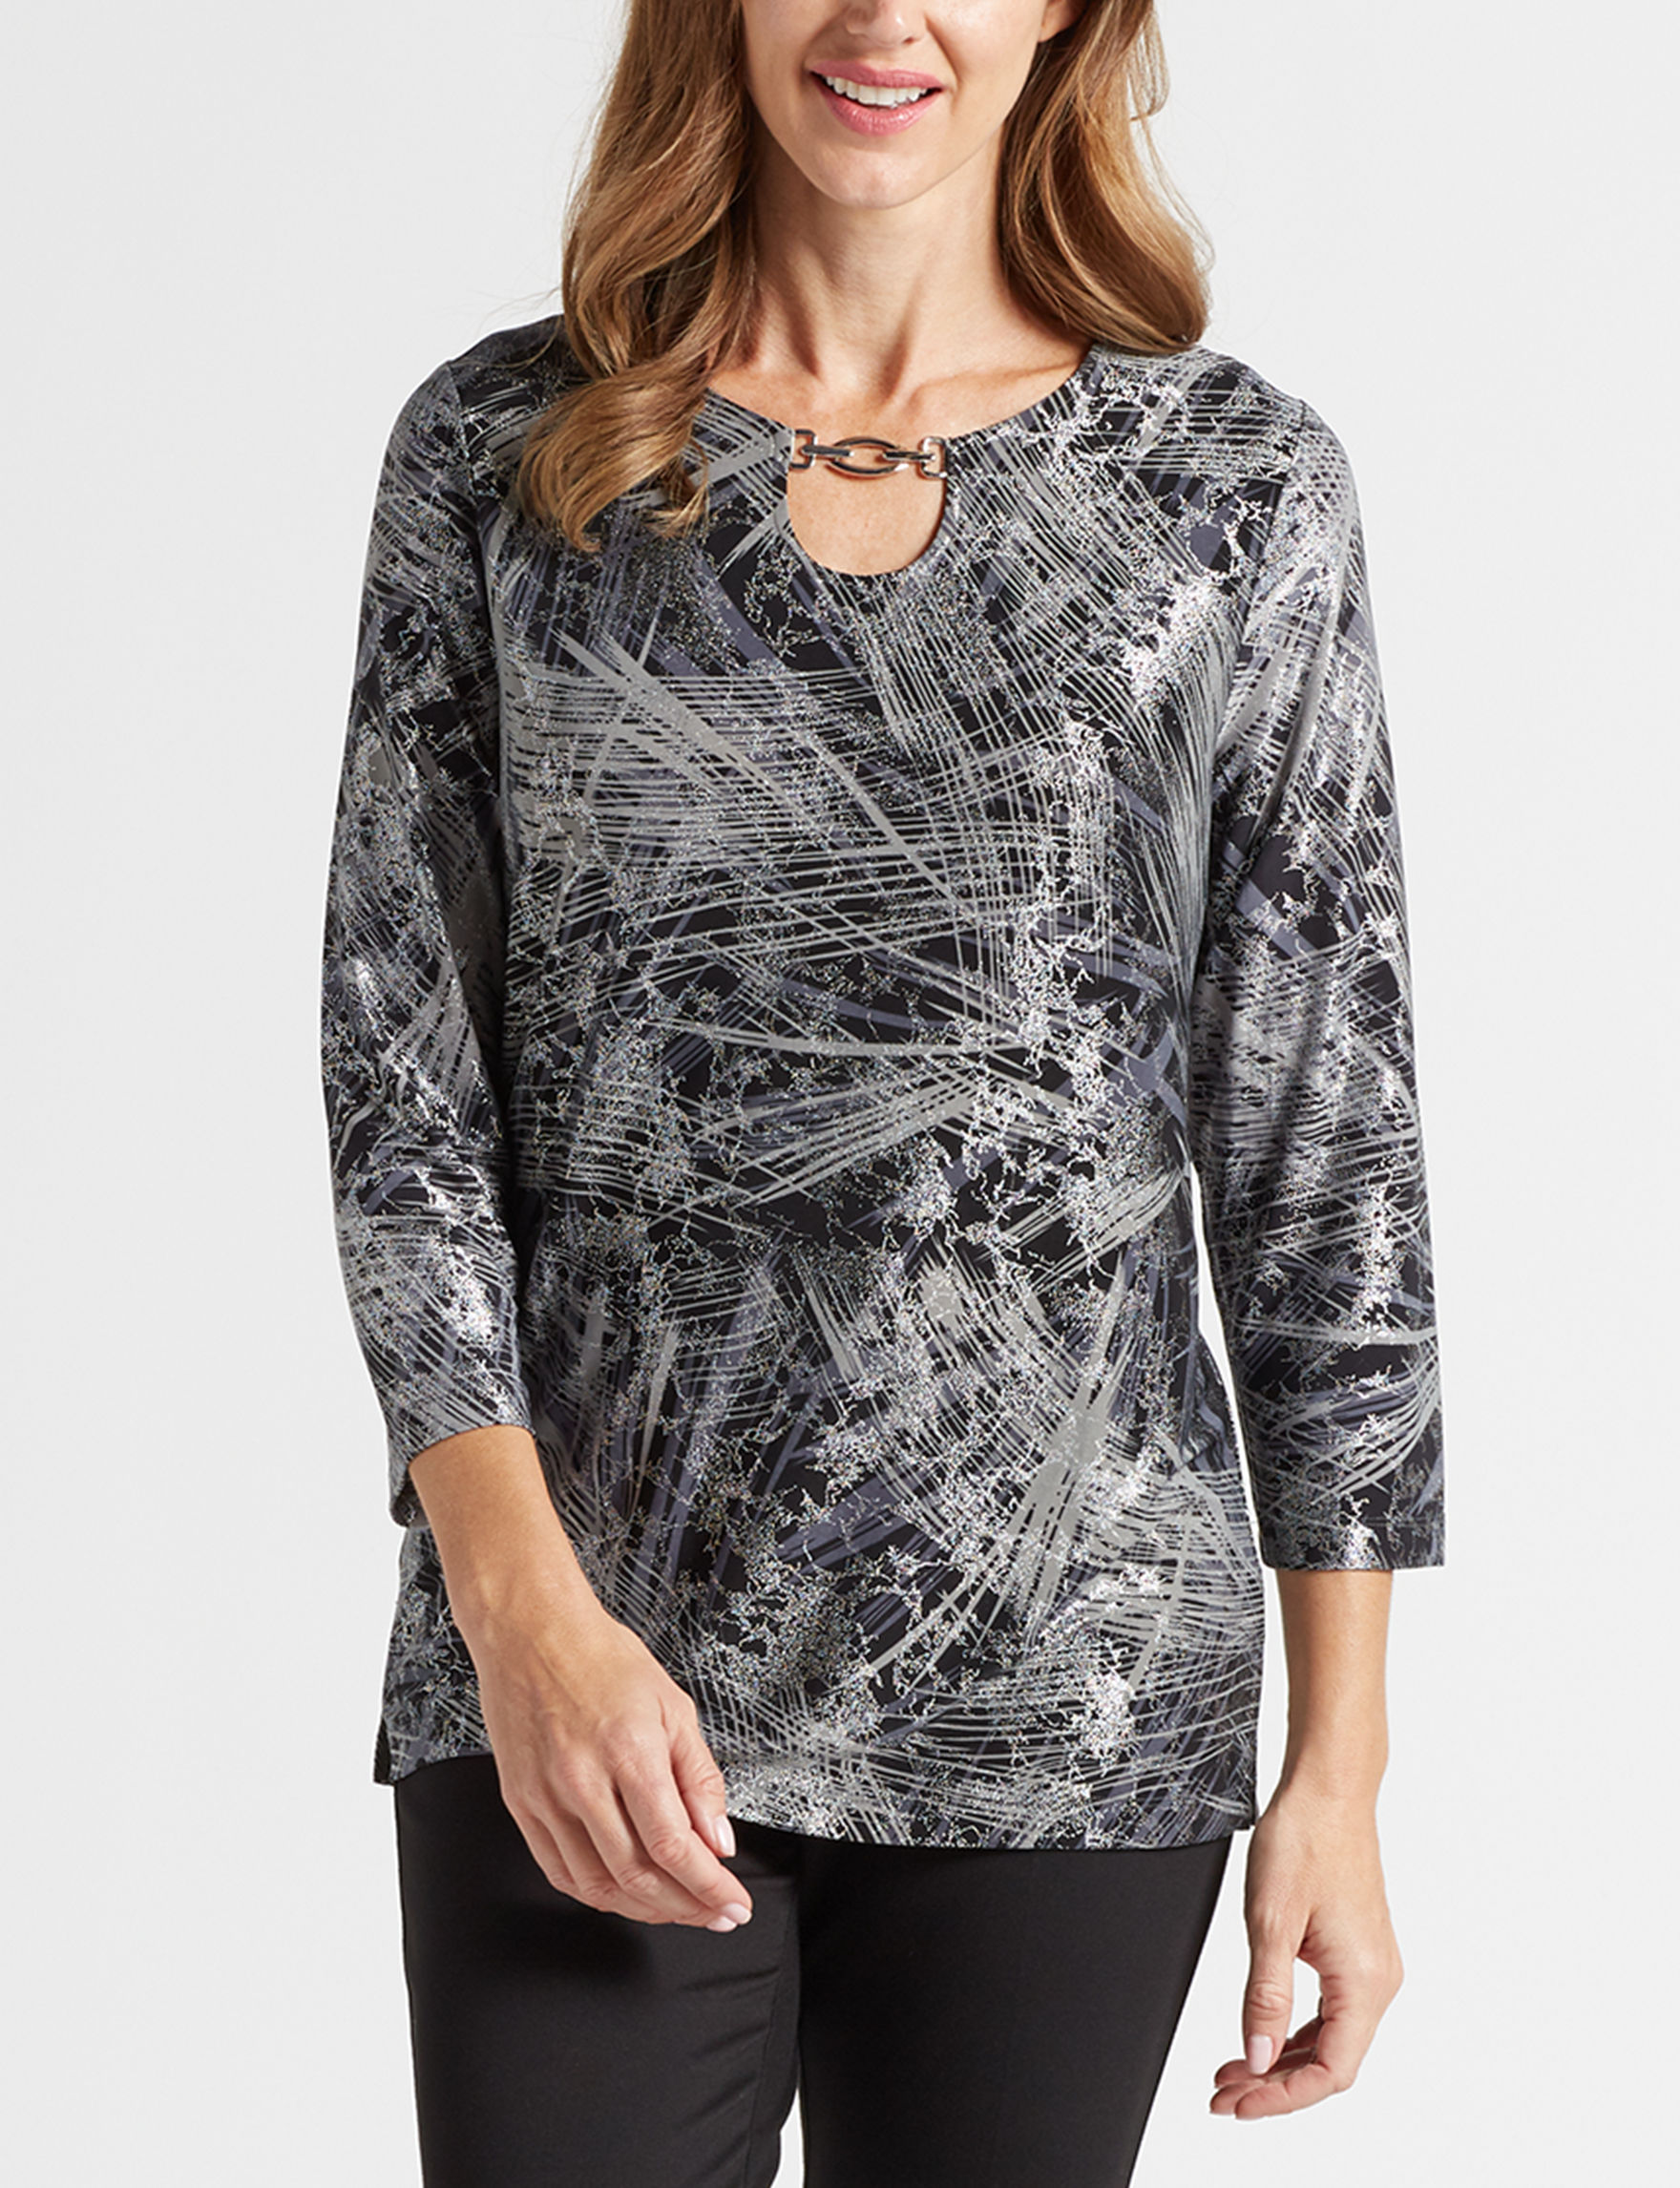 Rebecca Malone Black / Silver Shirts & Blouses